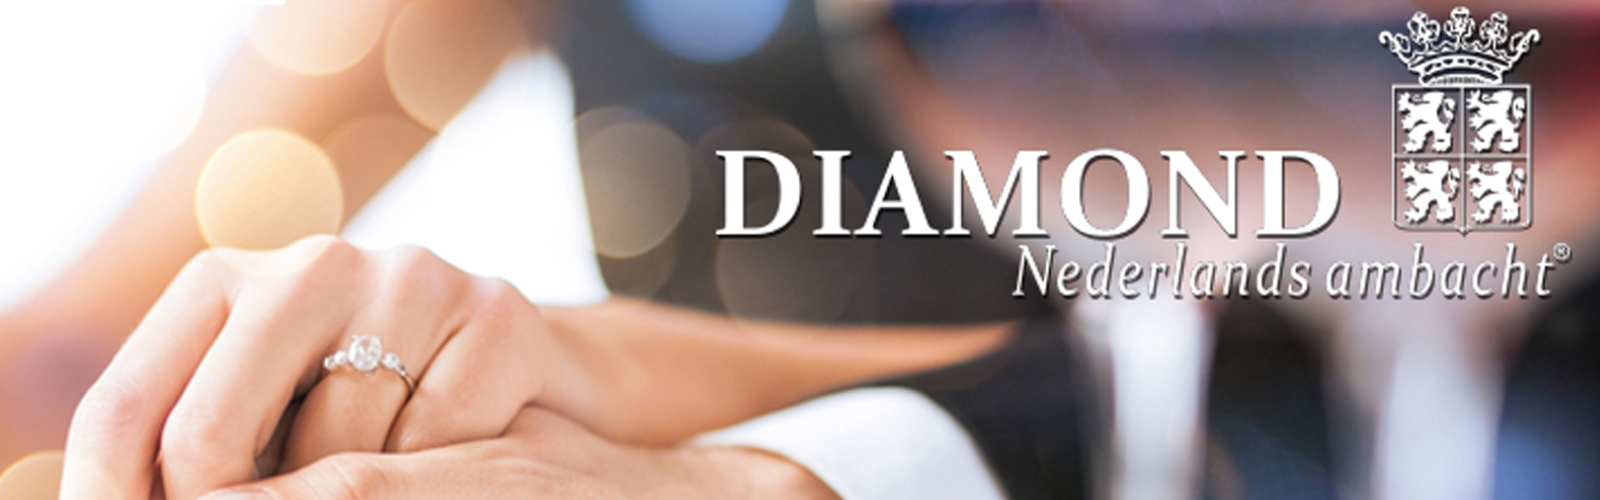 Diamond-Nederlands-Ambacht-groeibriljant-gouden-sieraden-Wolters-Juweliers-Coevorden-Emmen